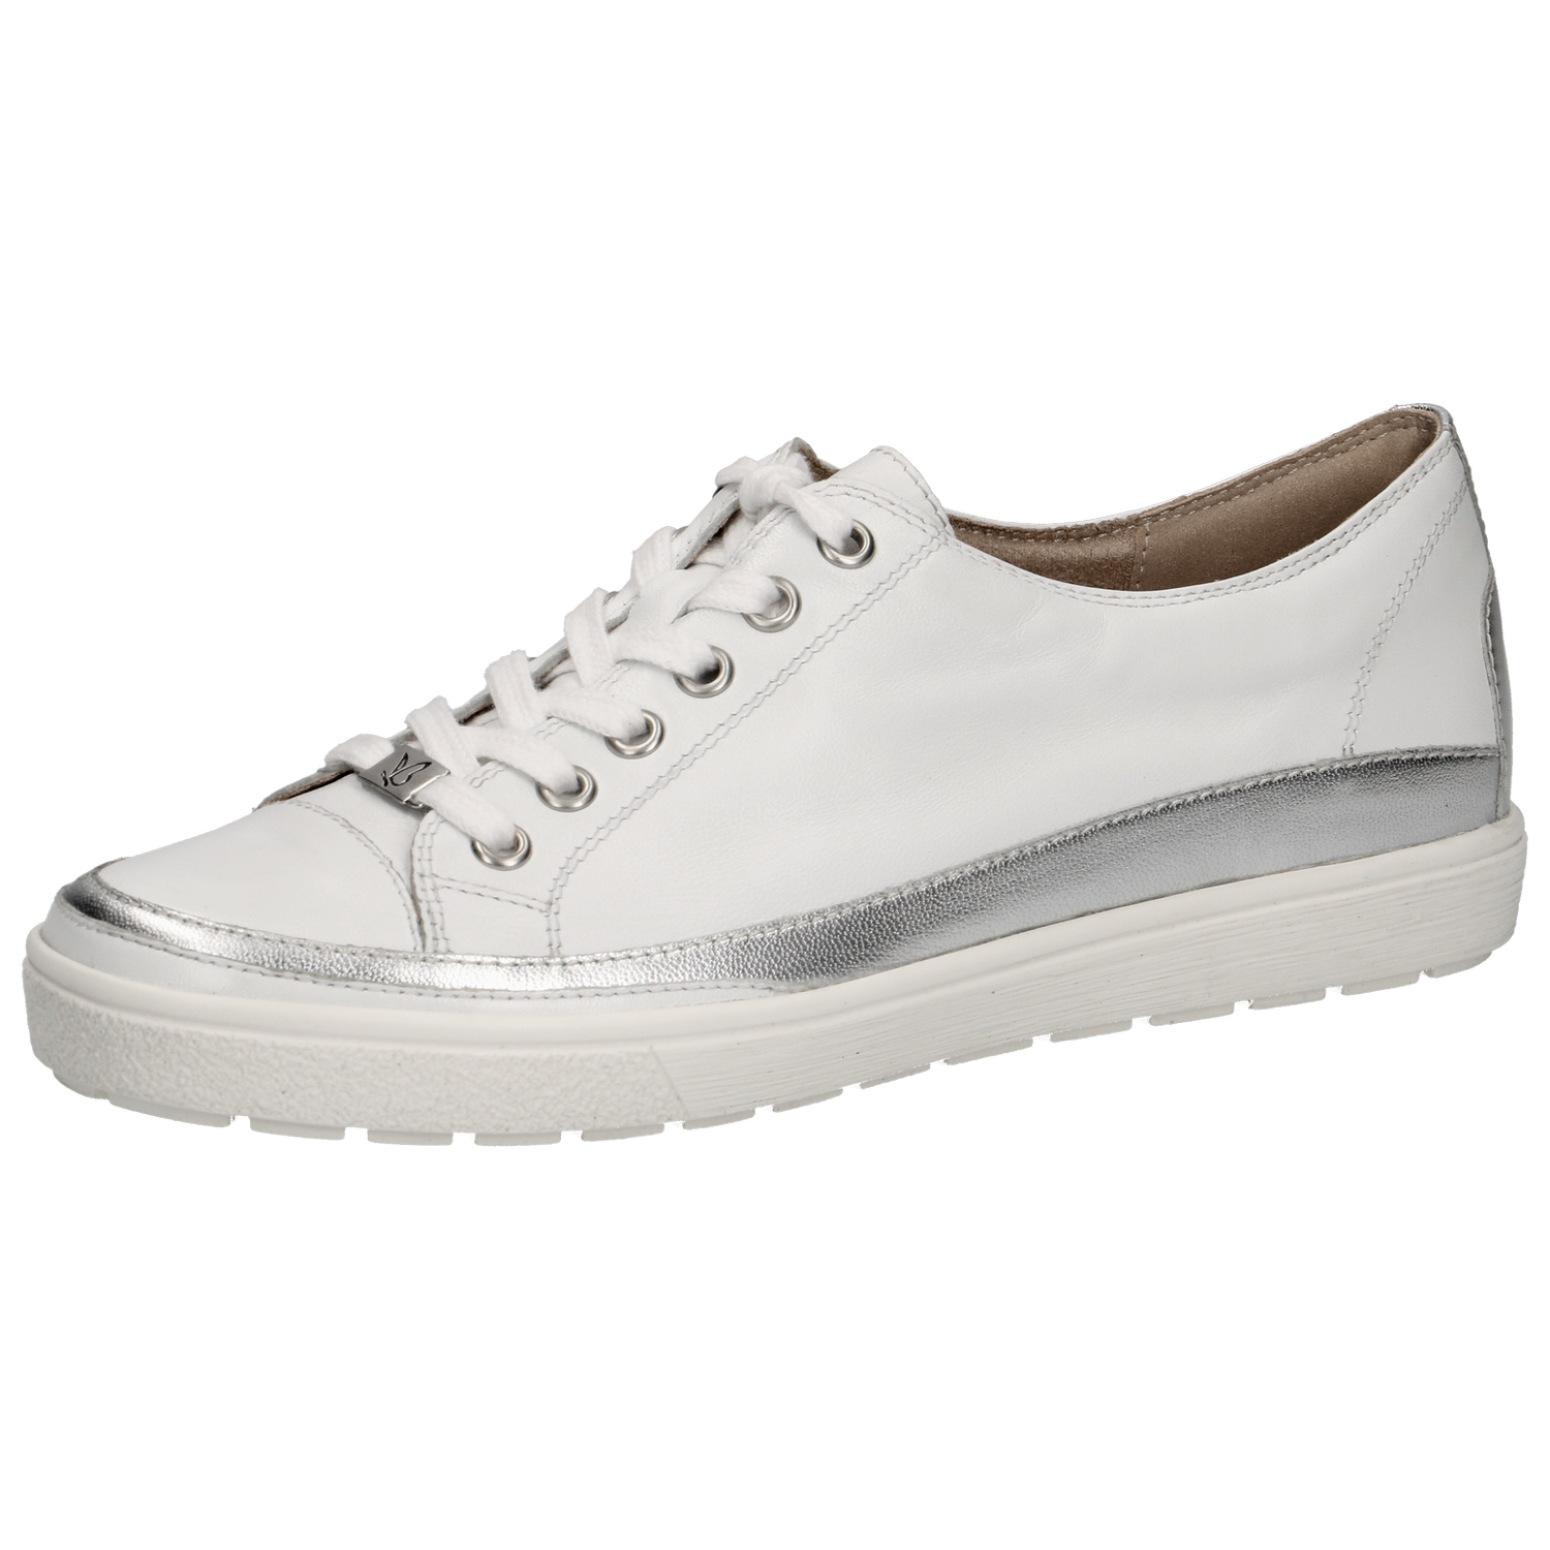 e703edff6142 Dámska vychádzková obuv CAPRICE 9-23654-22 102 WHITE NAPPA – Topánky  Olympia shoes